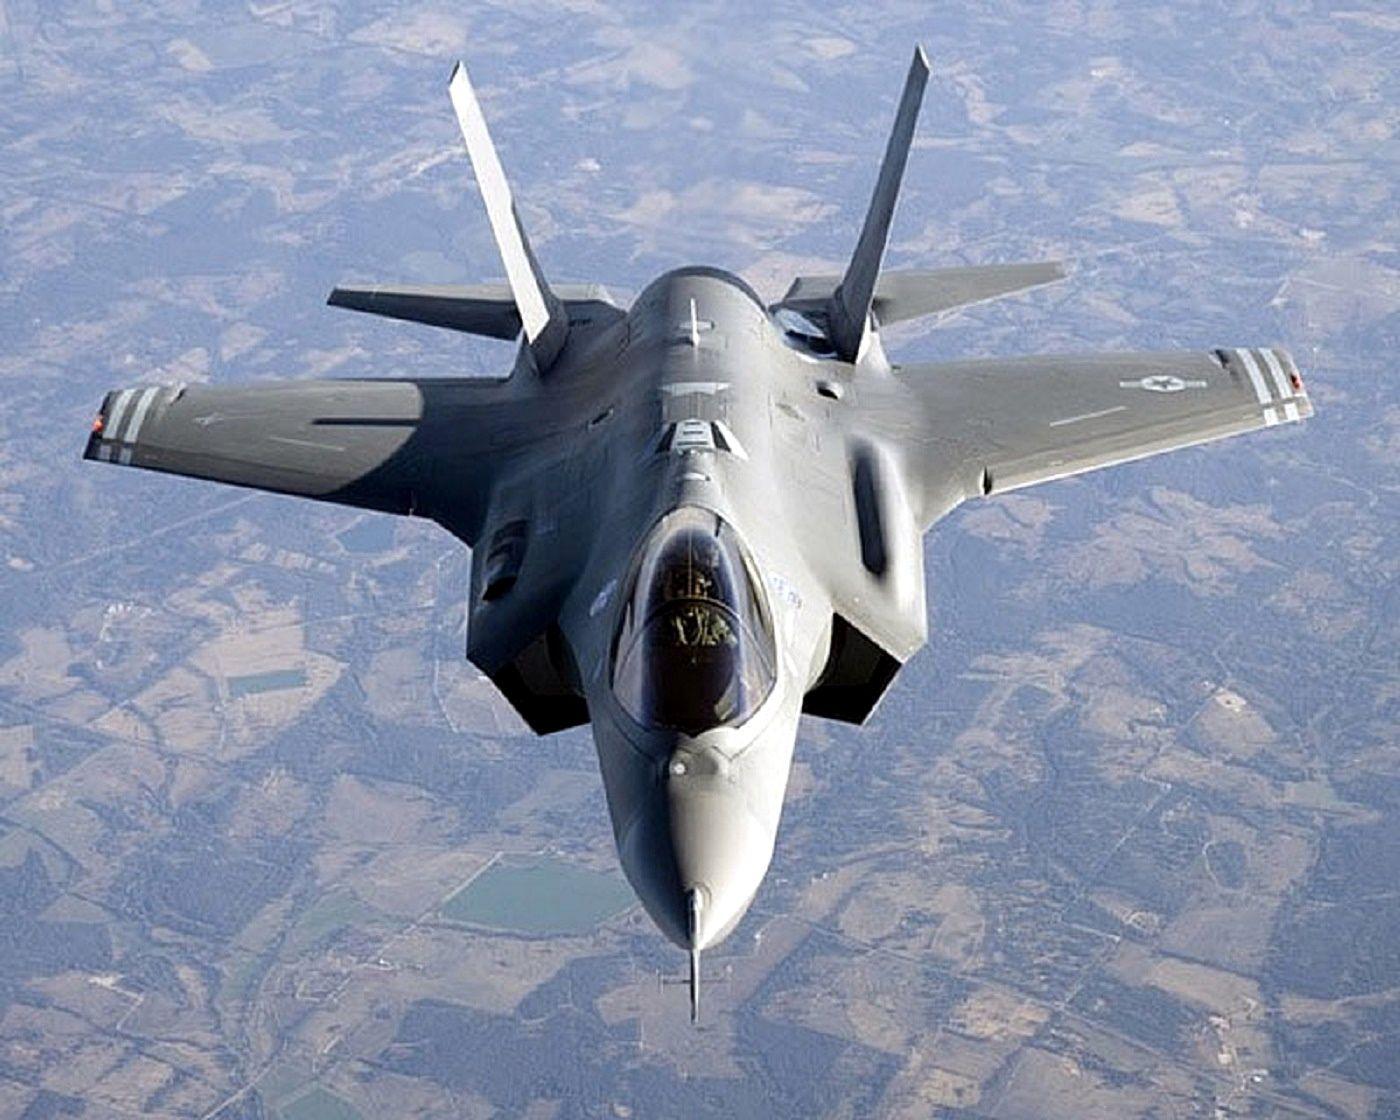 US AIR FORCE F-35 Lightning   http://www.taringa.net/posts/info/16668572/Los-Super-Aviones.html